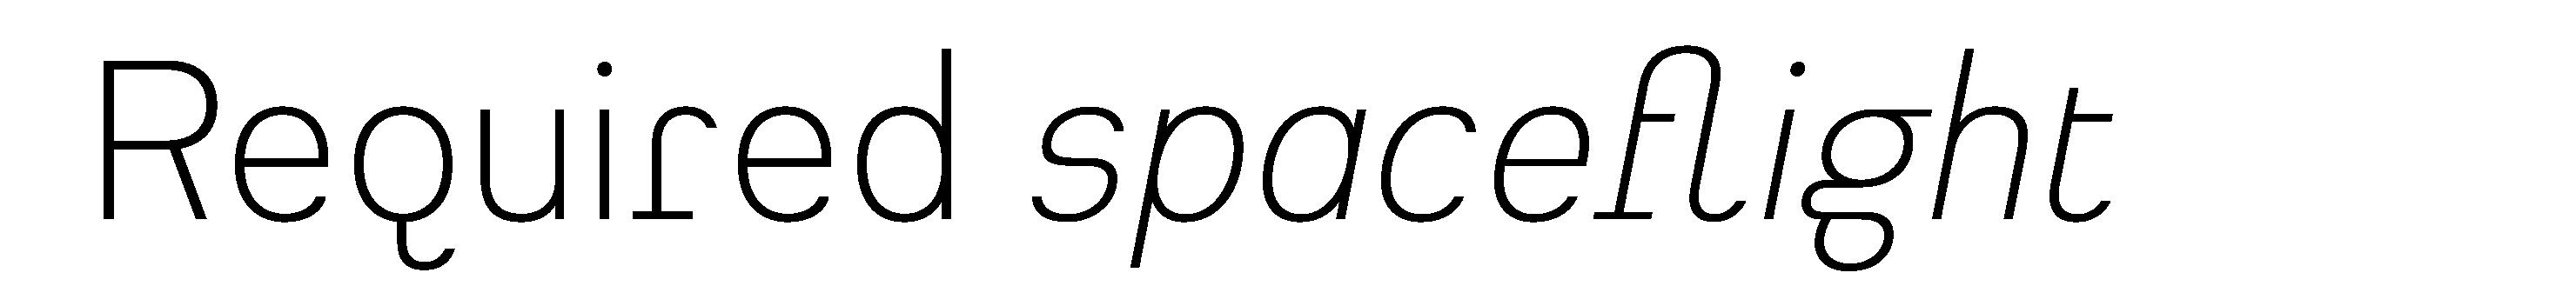 Typeface Heimat Sans D01 Atlas Font Foundry